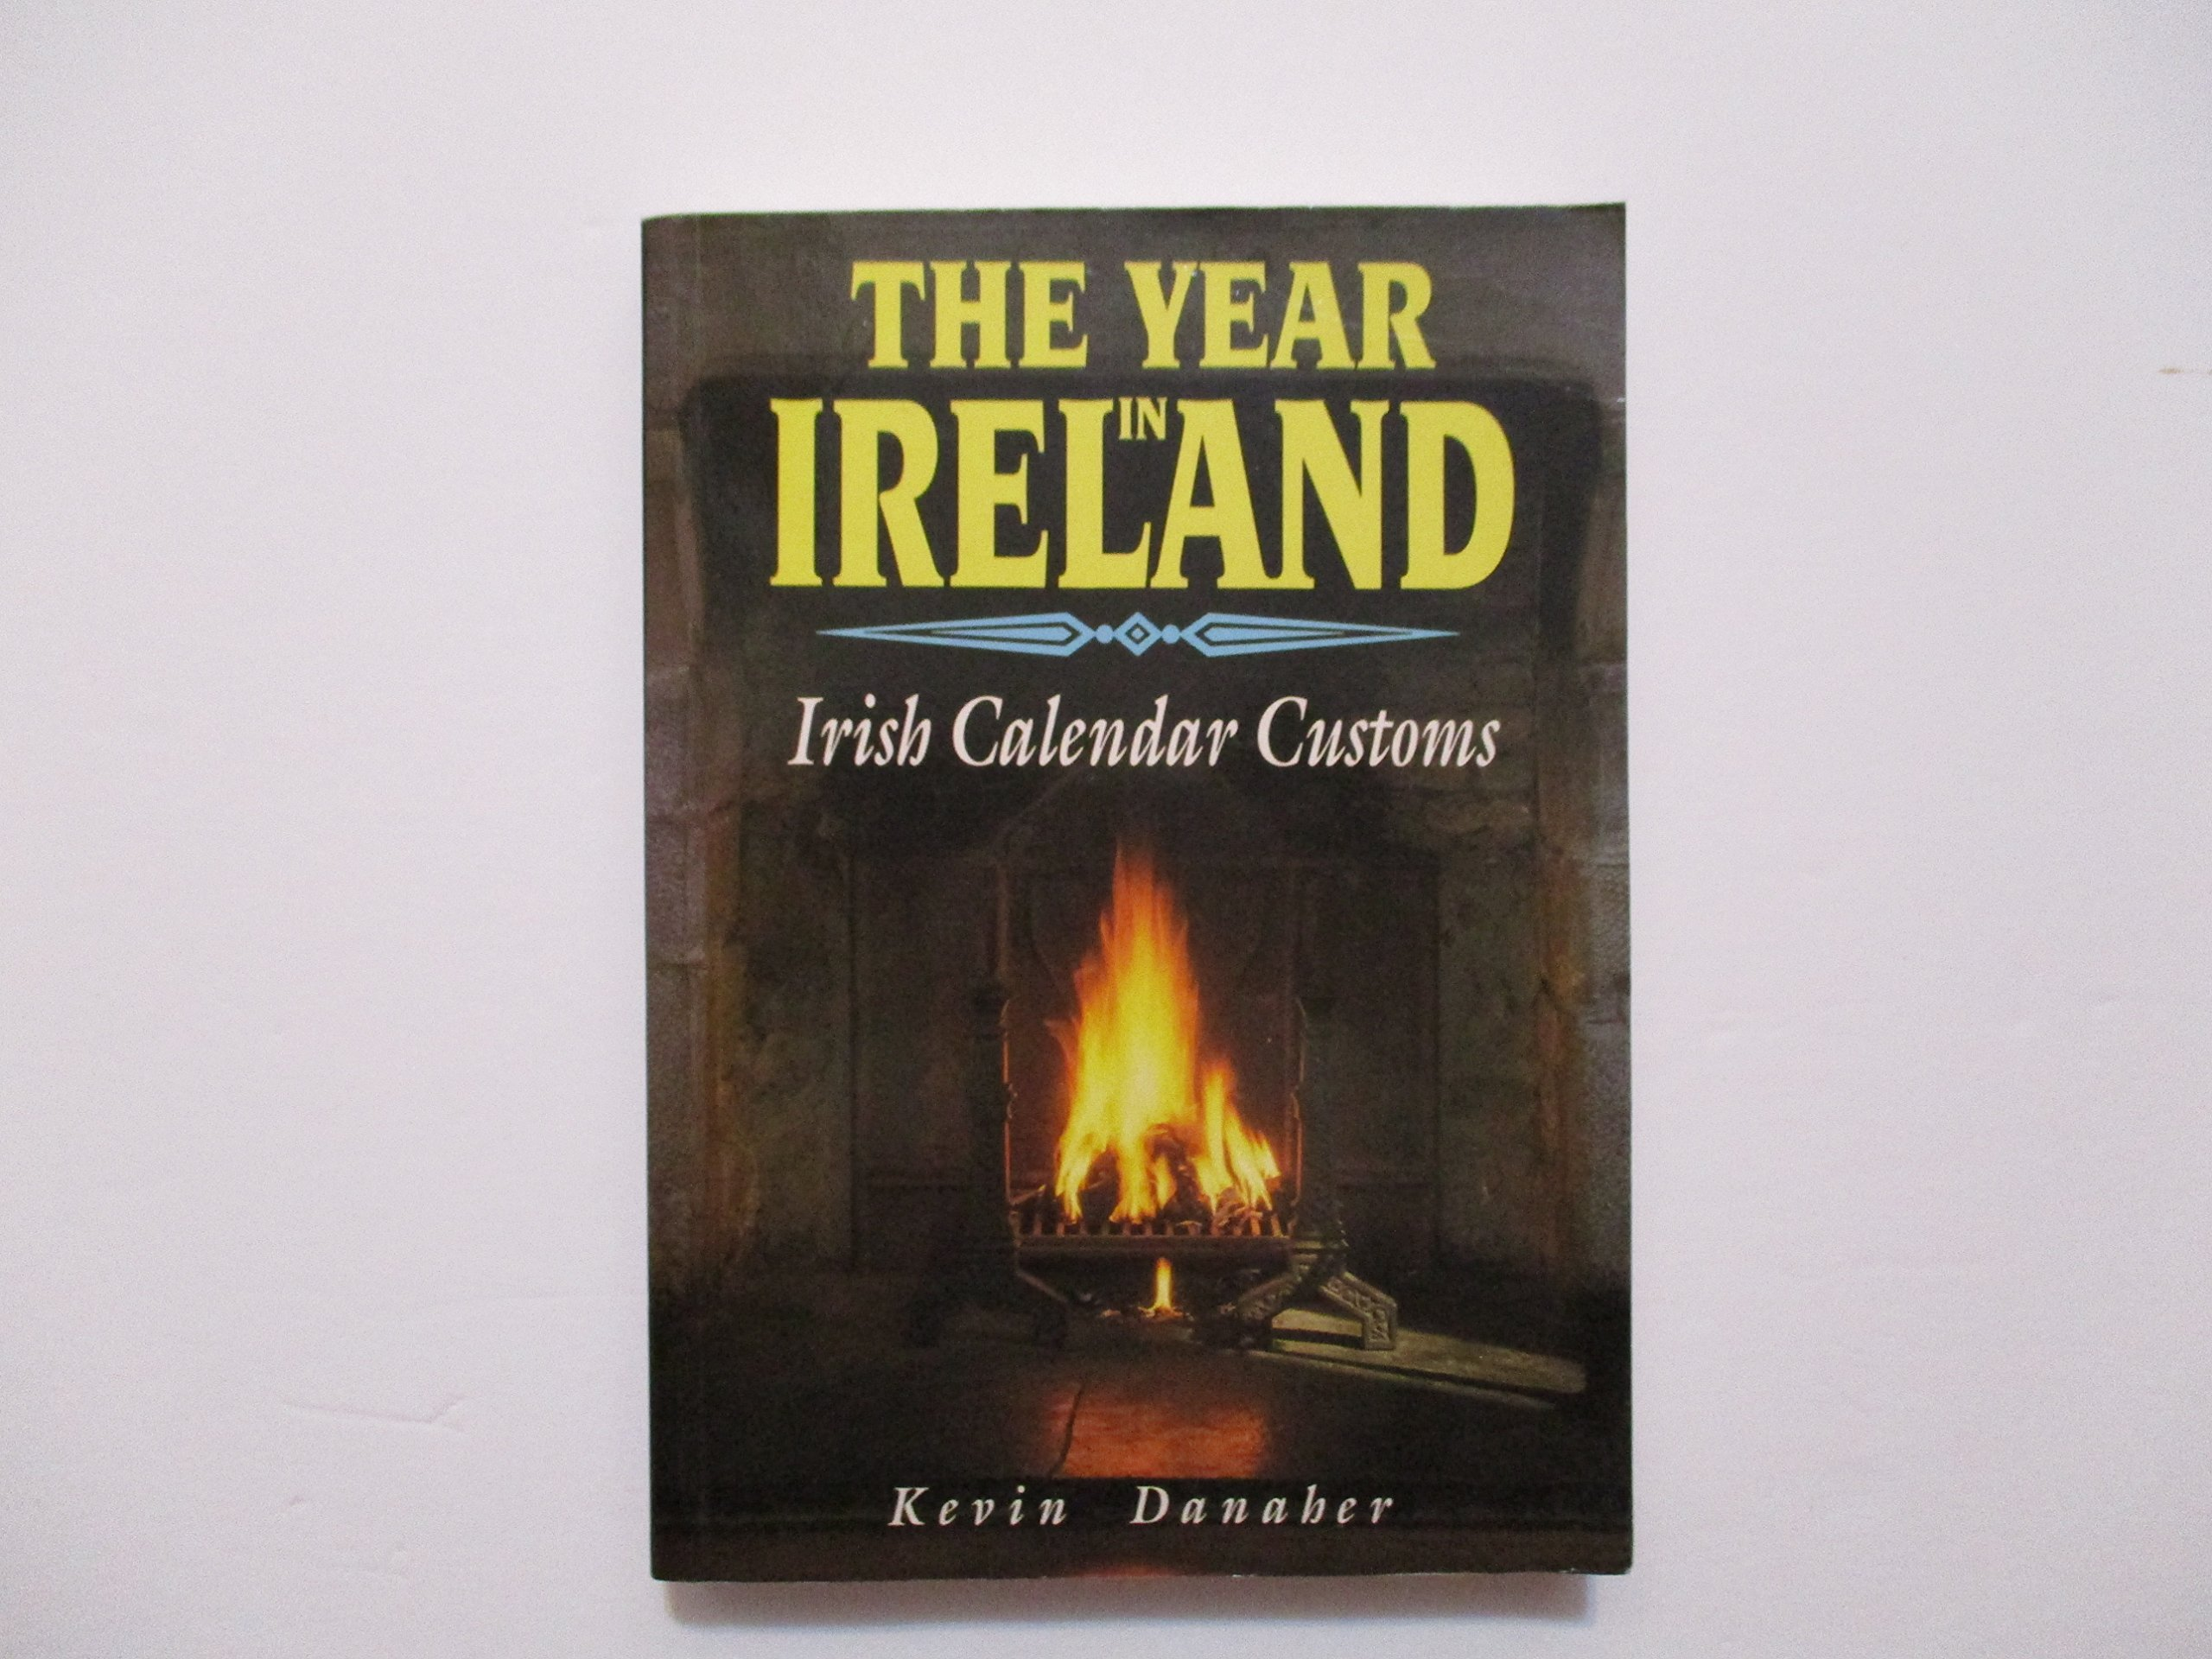 Buy The Year In Ireland Irish Calendar Customs Book Online At Low